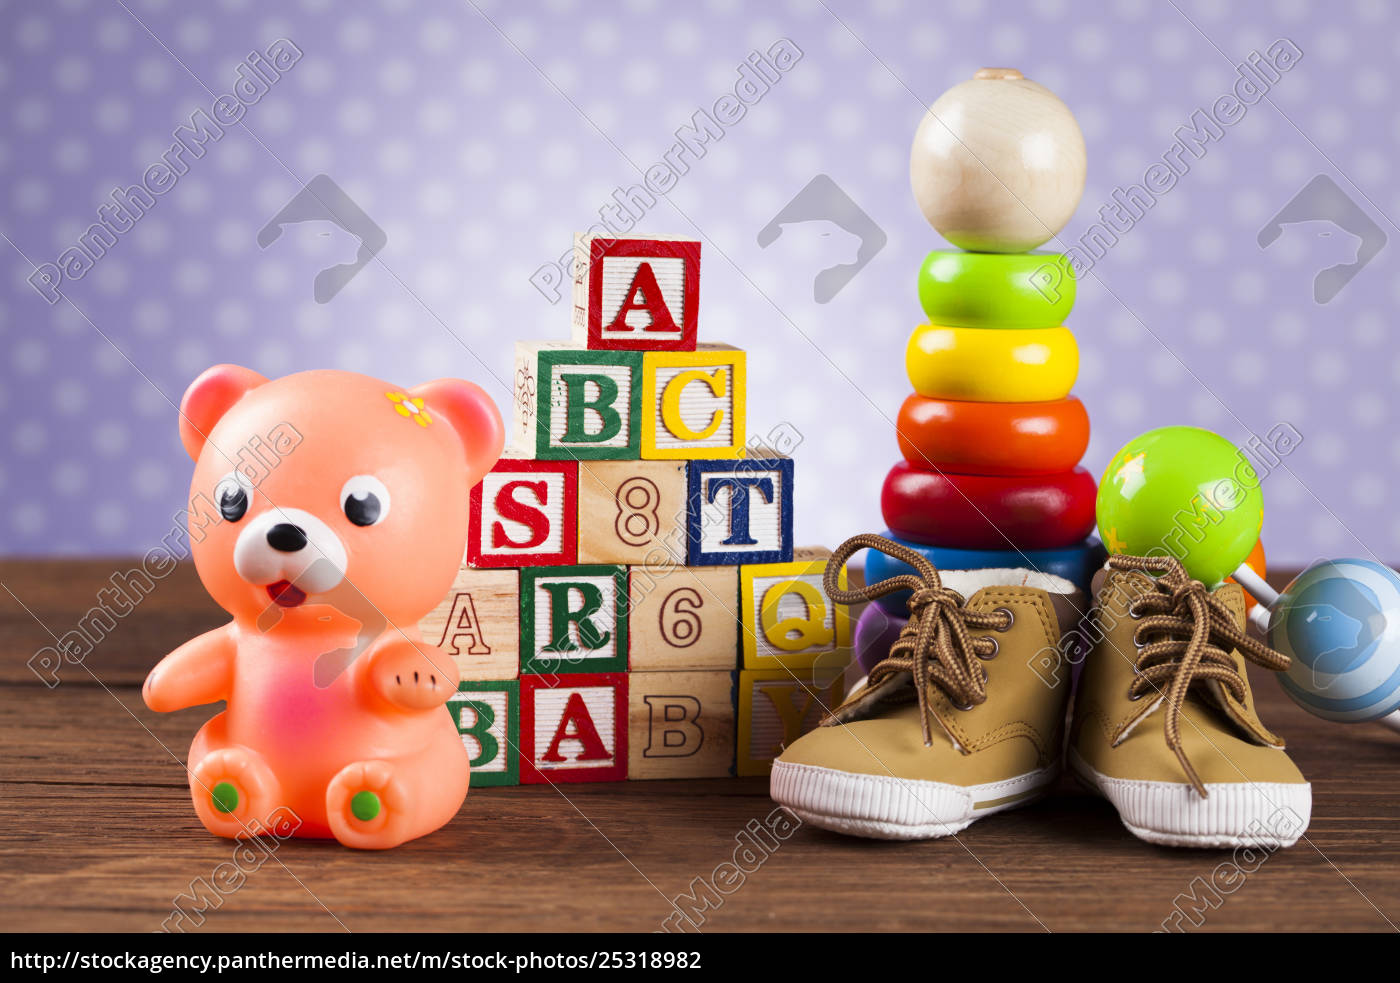 children's, of, toy, accessories, on, wooden - 25318982